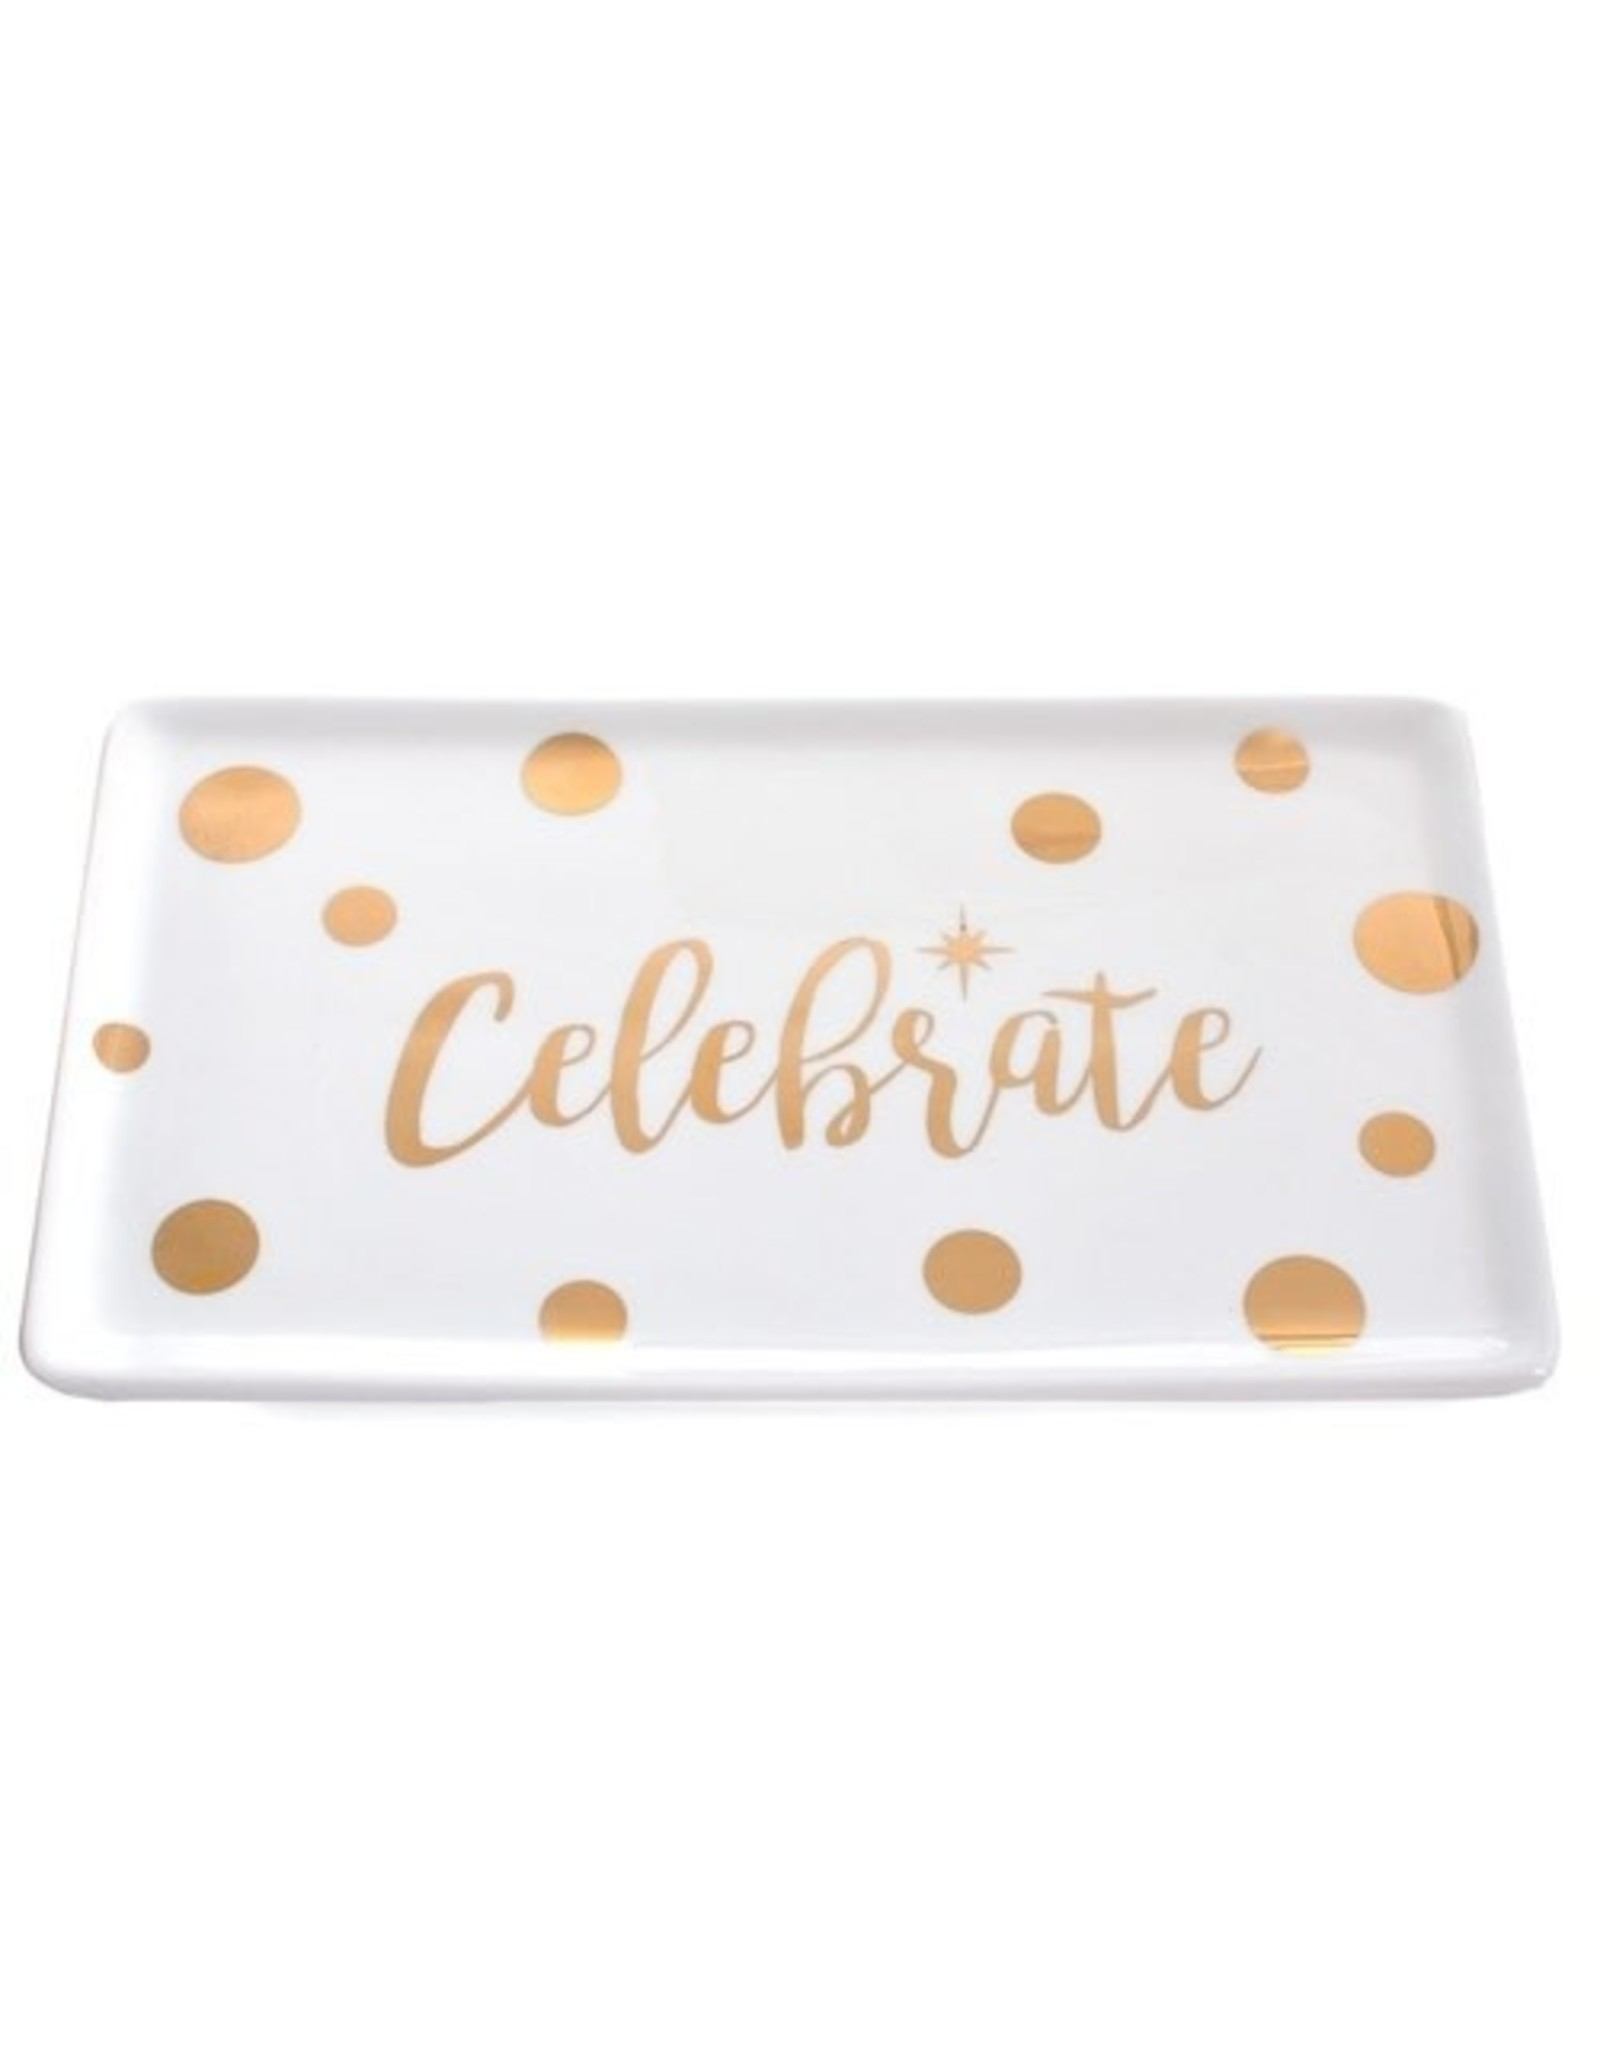 Roux Brand Celebrate Platter